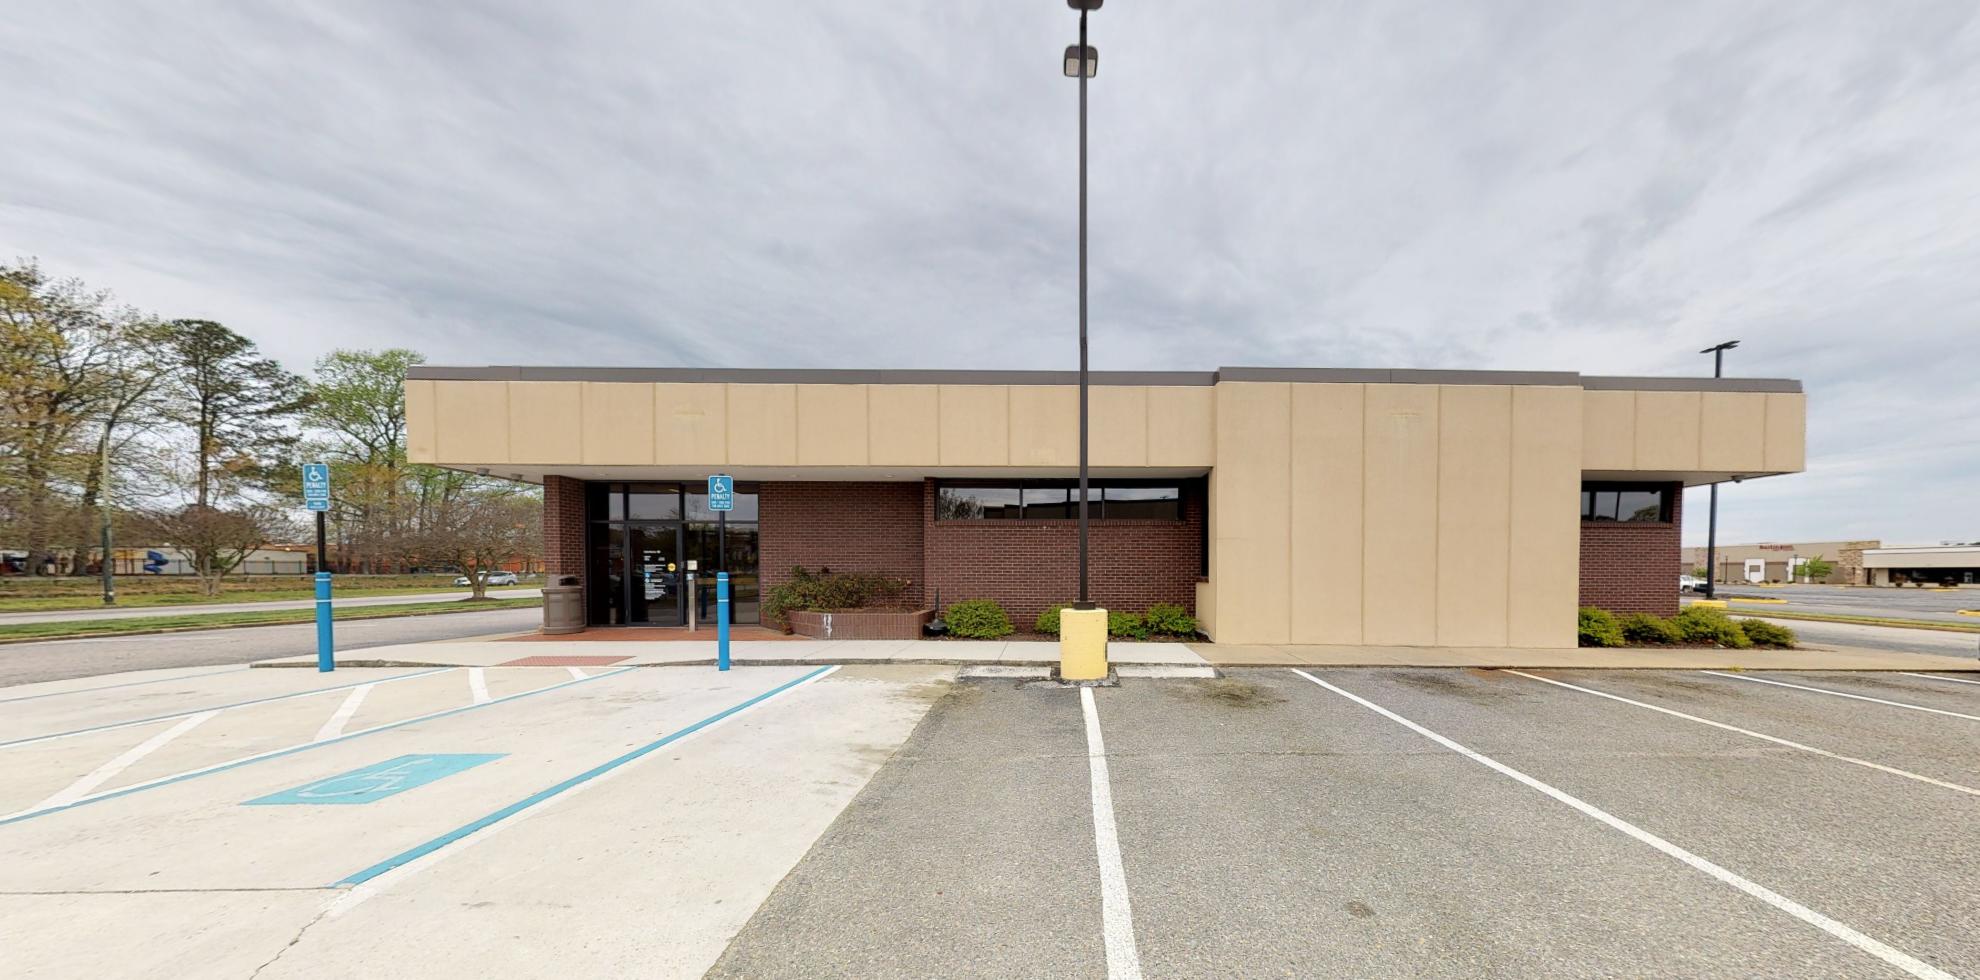 Bank of America financial center with drive-thru ATM | 14346 Warwick Blvd STE 300, Newport News, VA 23602